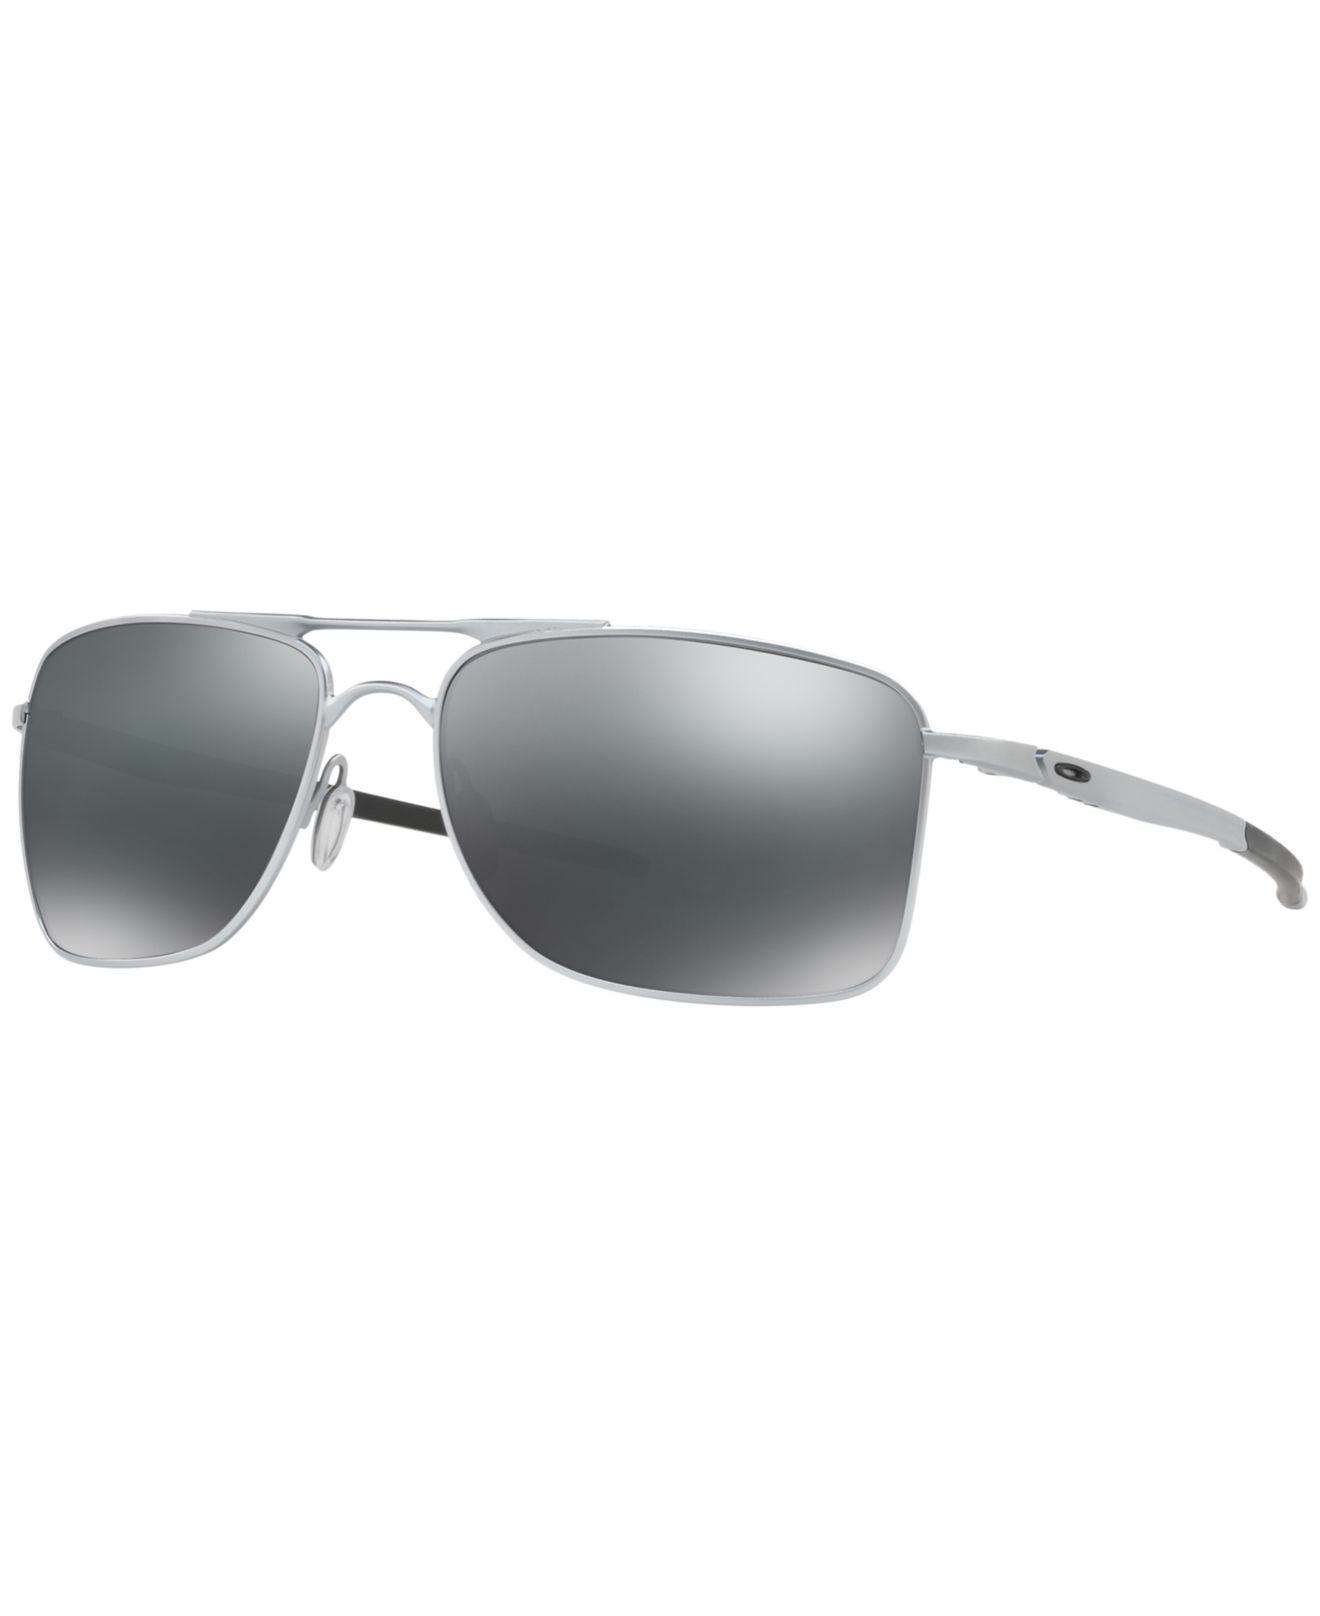 6cbf185cd2 Oakley. Men s Gray Gauge 8 Sunglasses ...